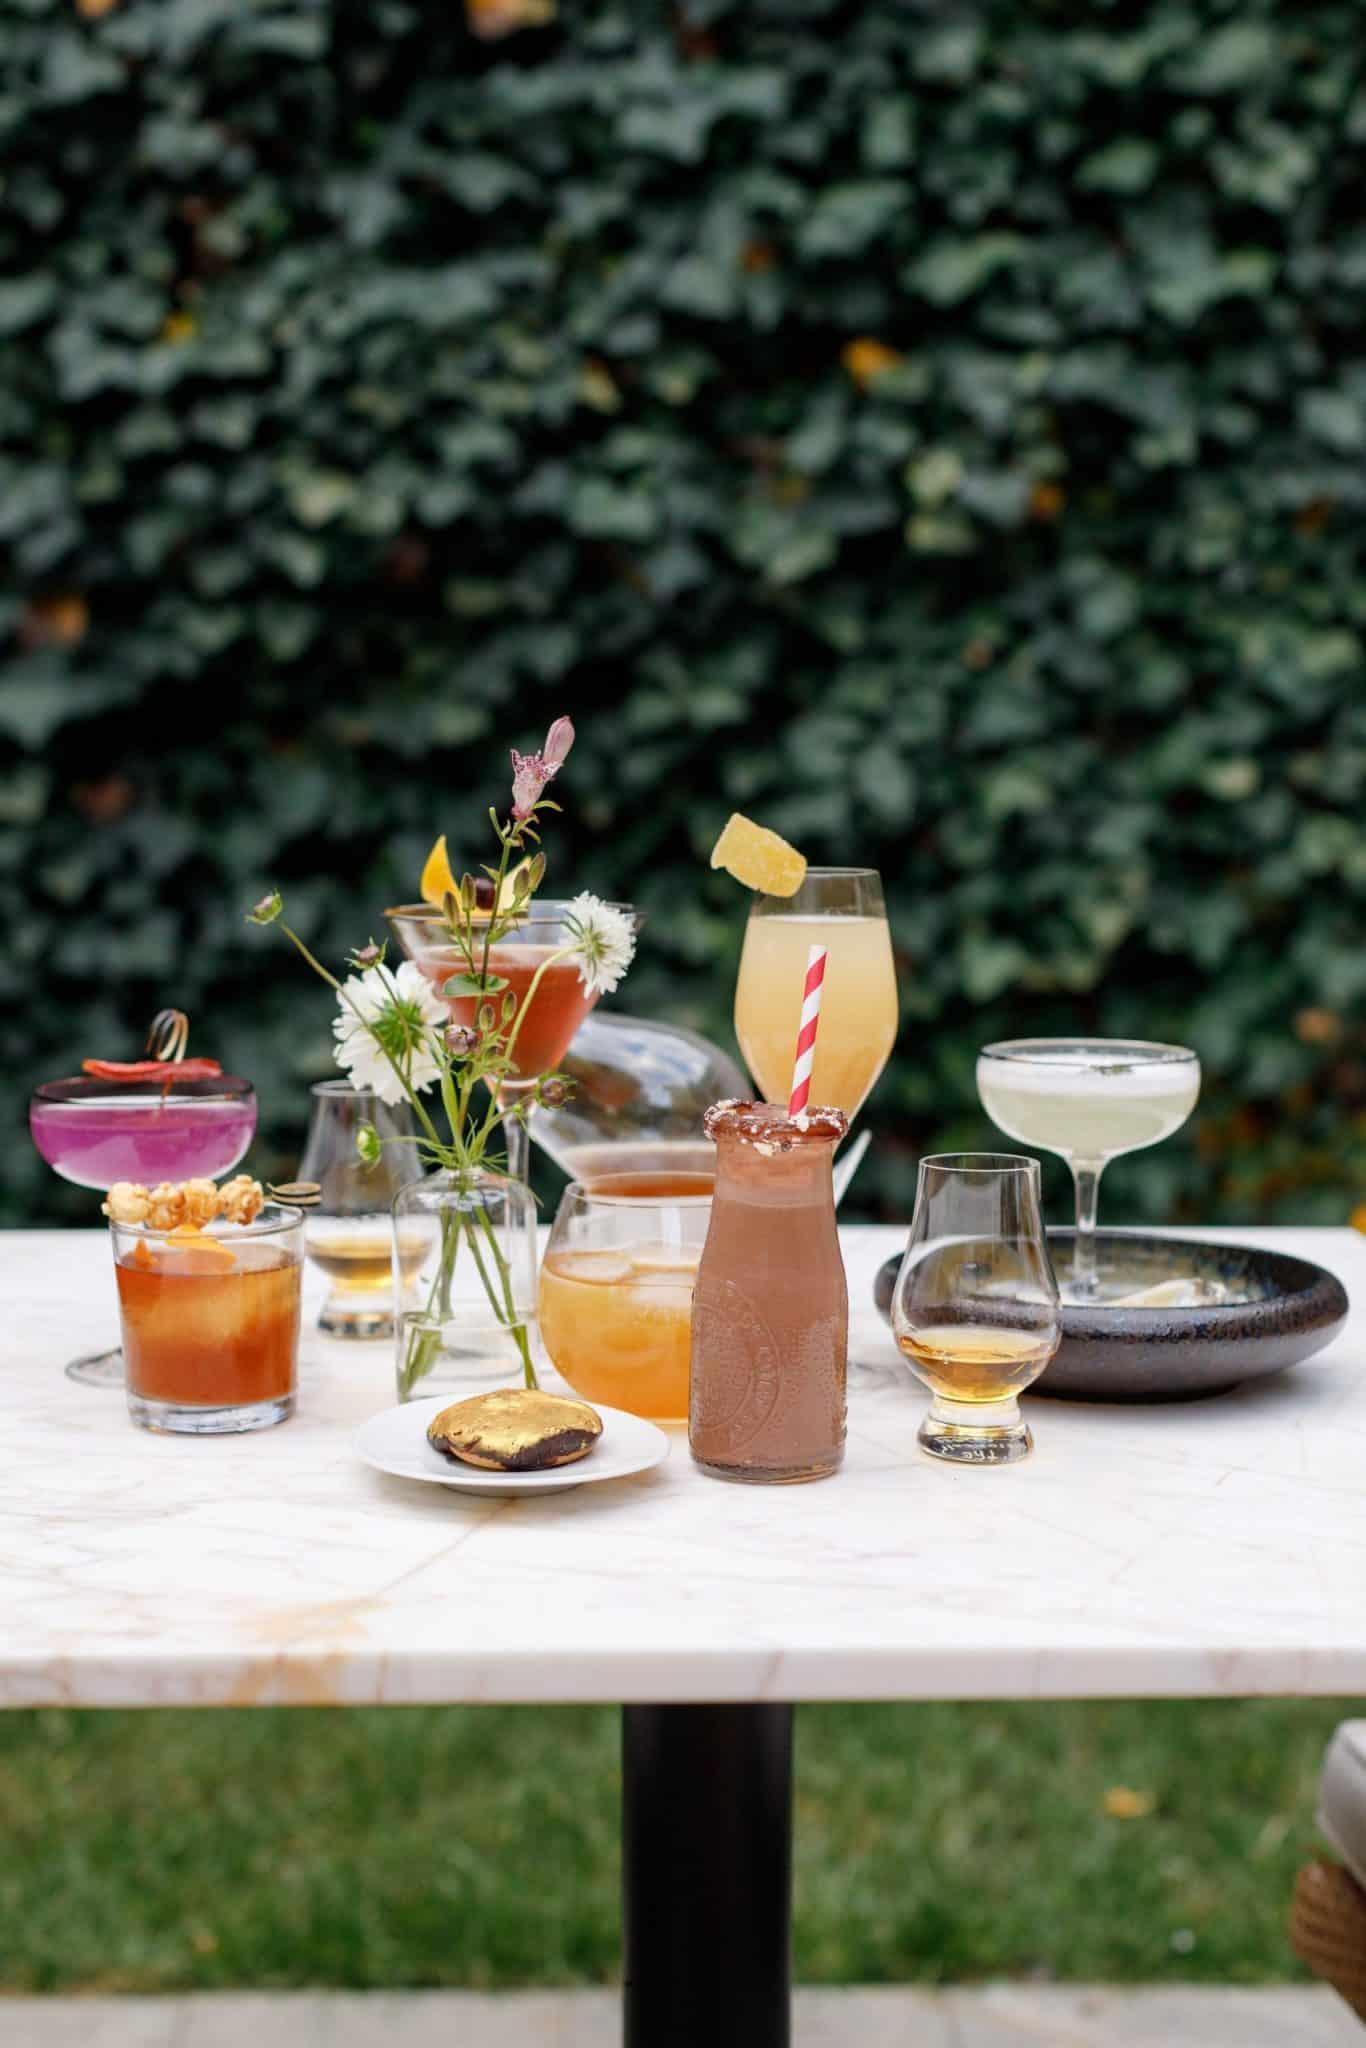 An array of drinks on a table